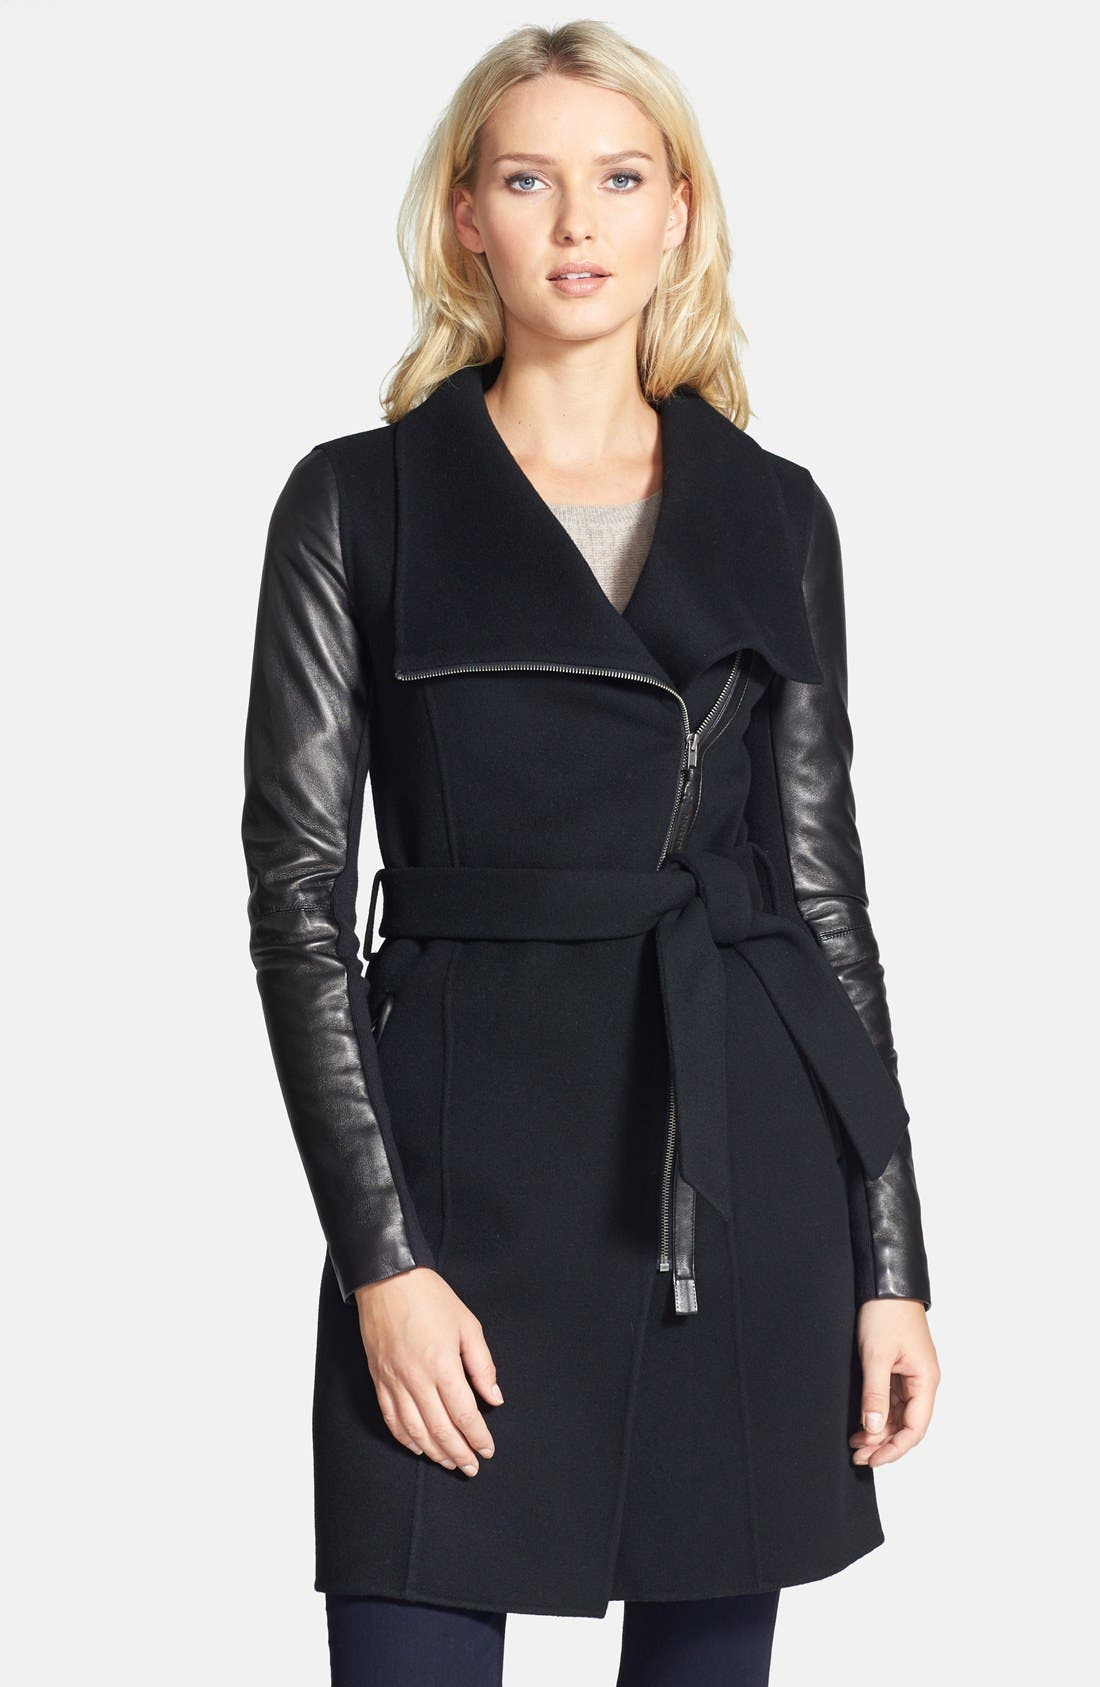 Main Image - Mackage 'Hemy' Leather Sleeve Asymmetrical Long Coat